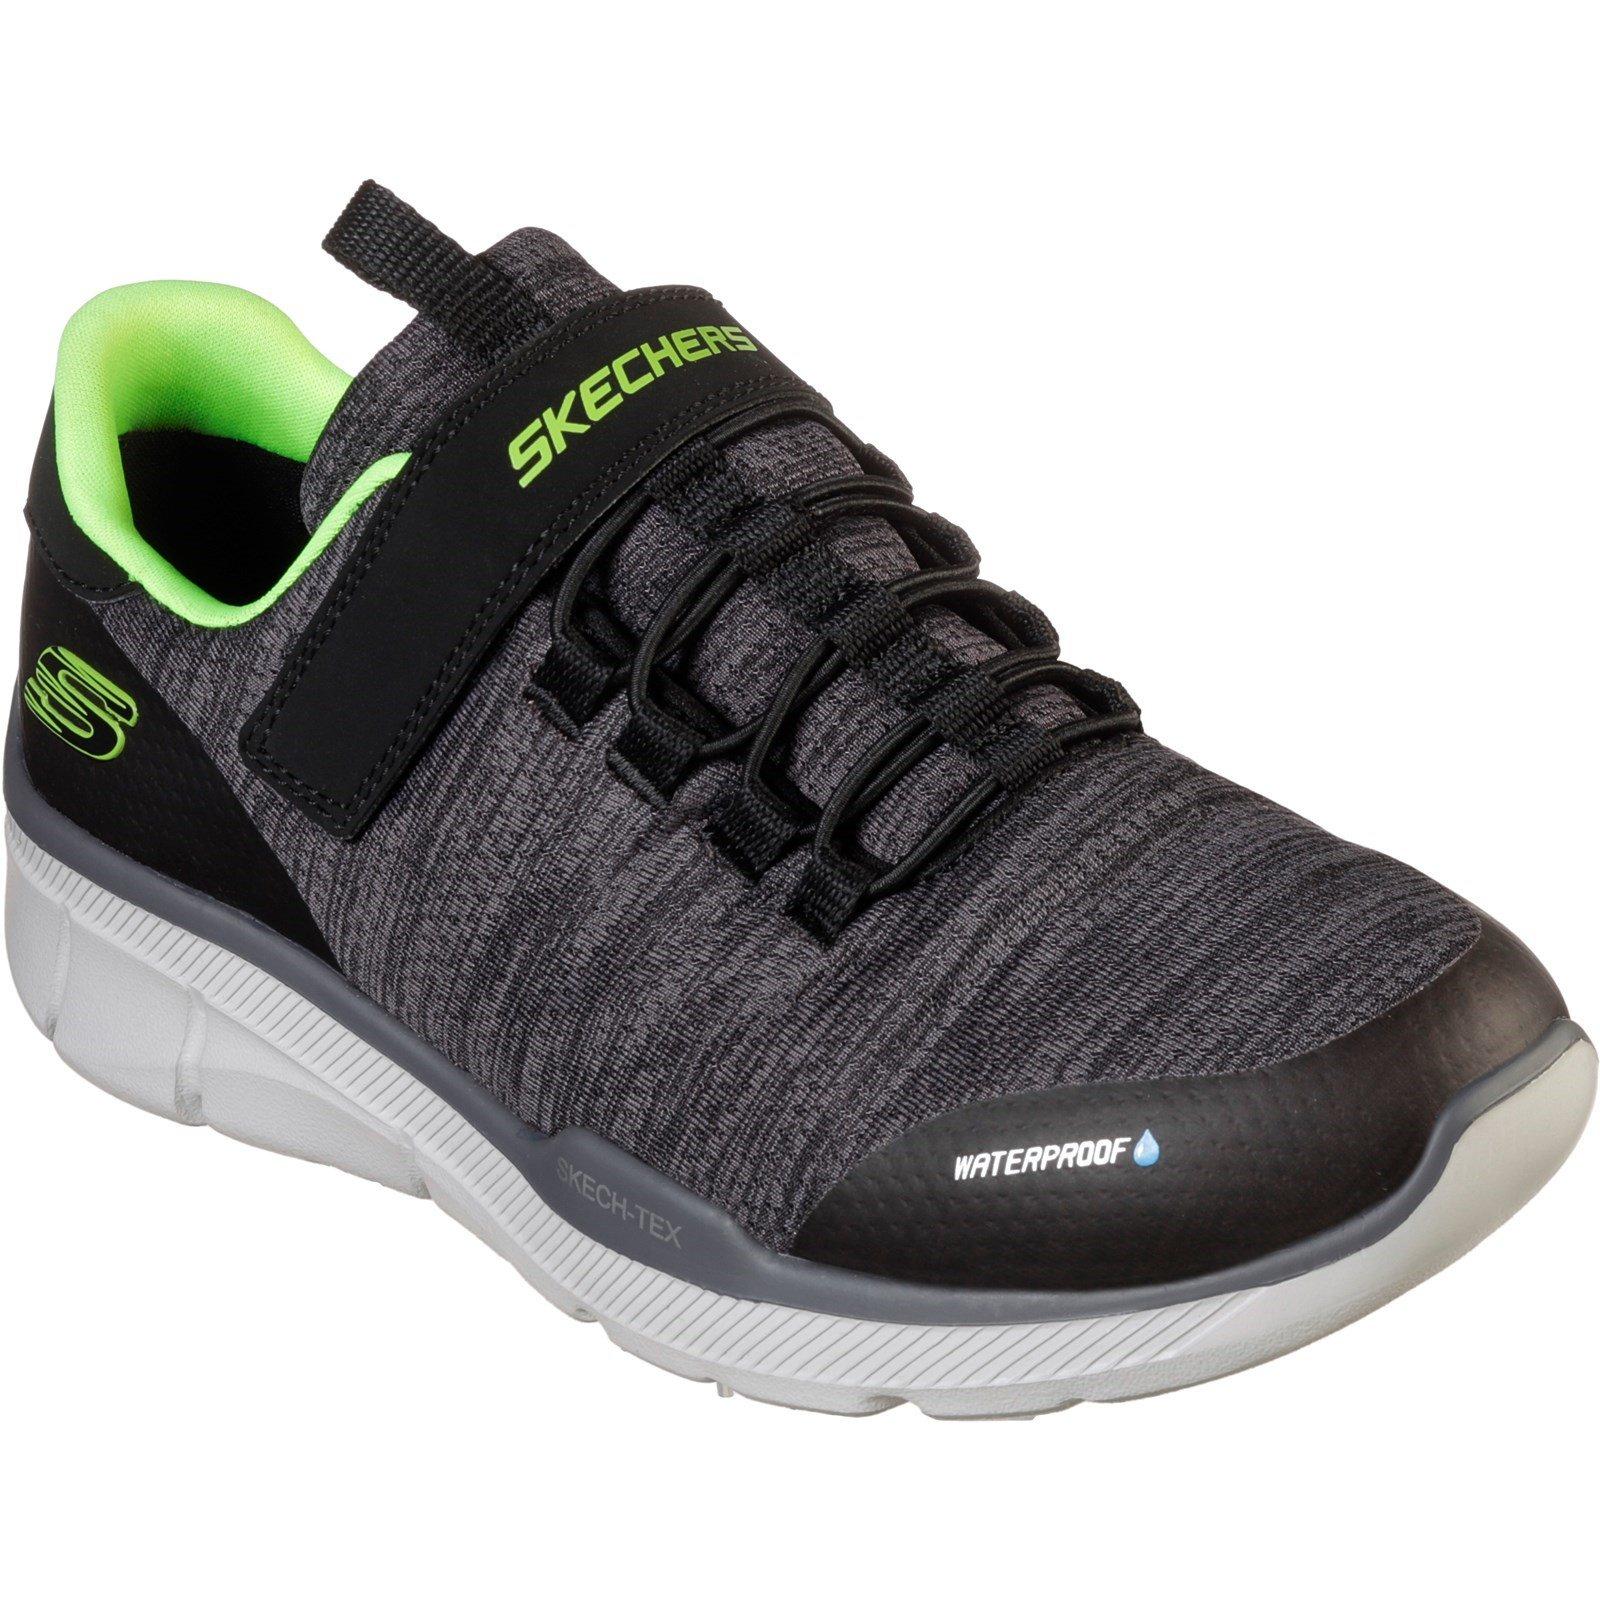 Skechers Unisex Equalizer 3.0 Aquablast Trainer Black 28533 - Black/Charcoal 10